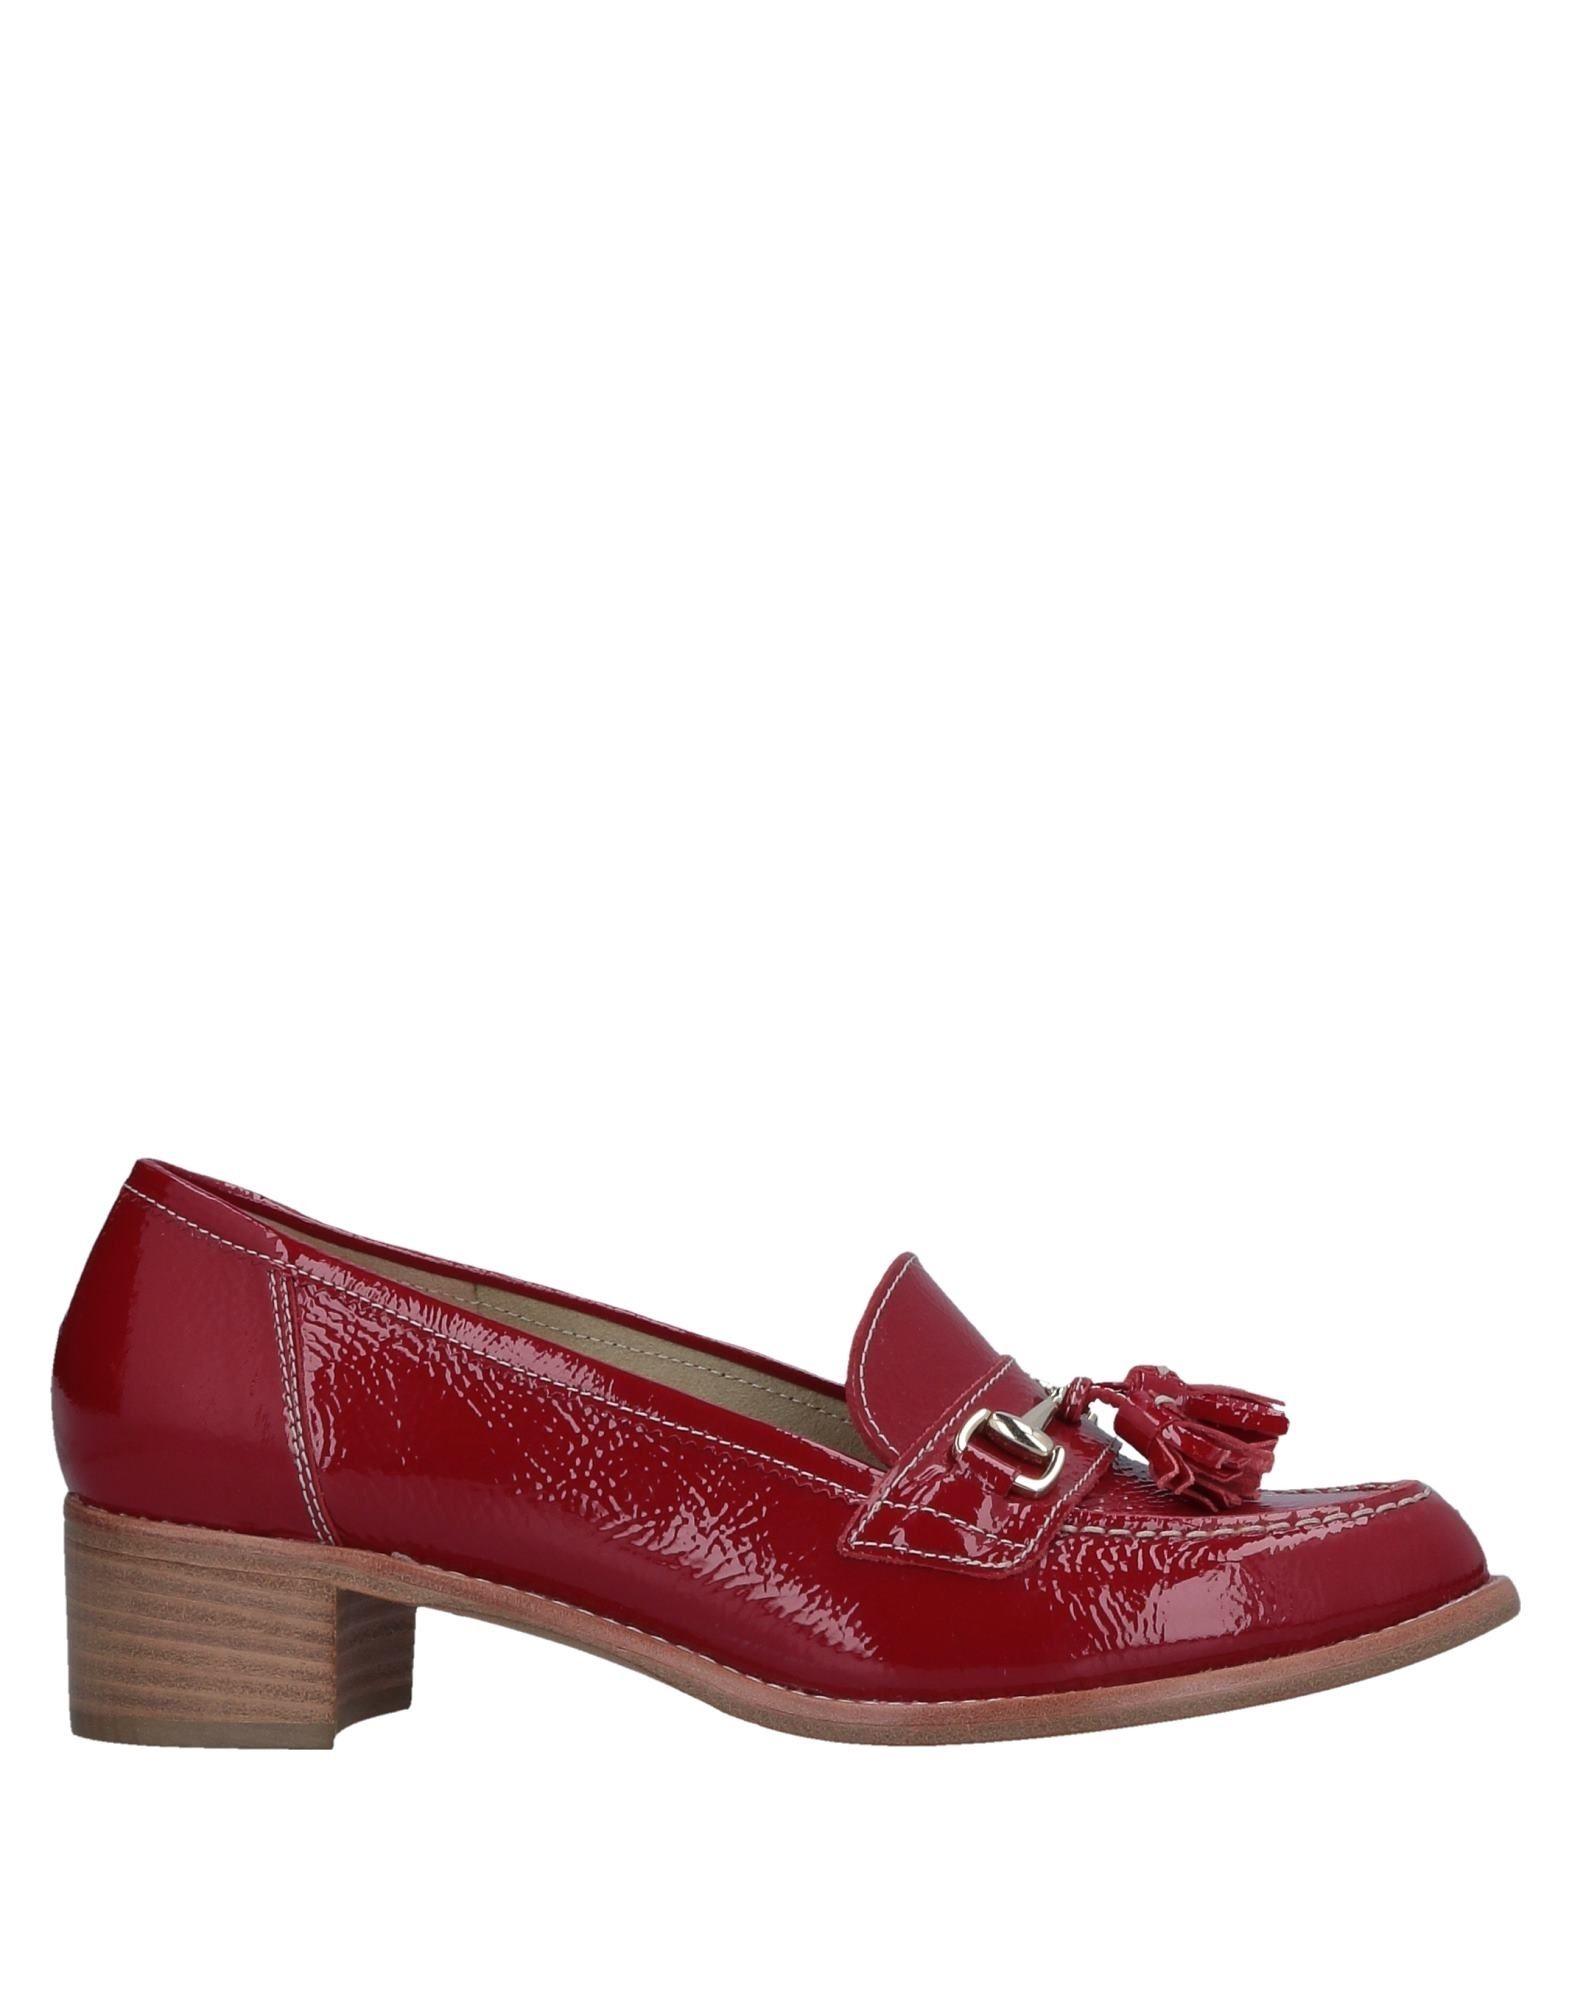 Stilvolle billige Schuhe F.Lli  Bruglia Mokassins Damen  F.Lli 11528556JM e7de90